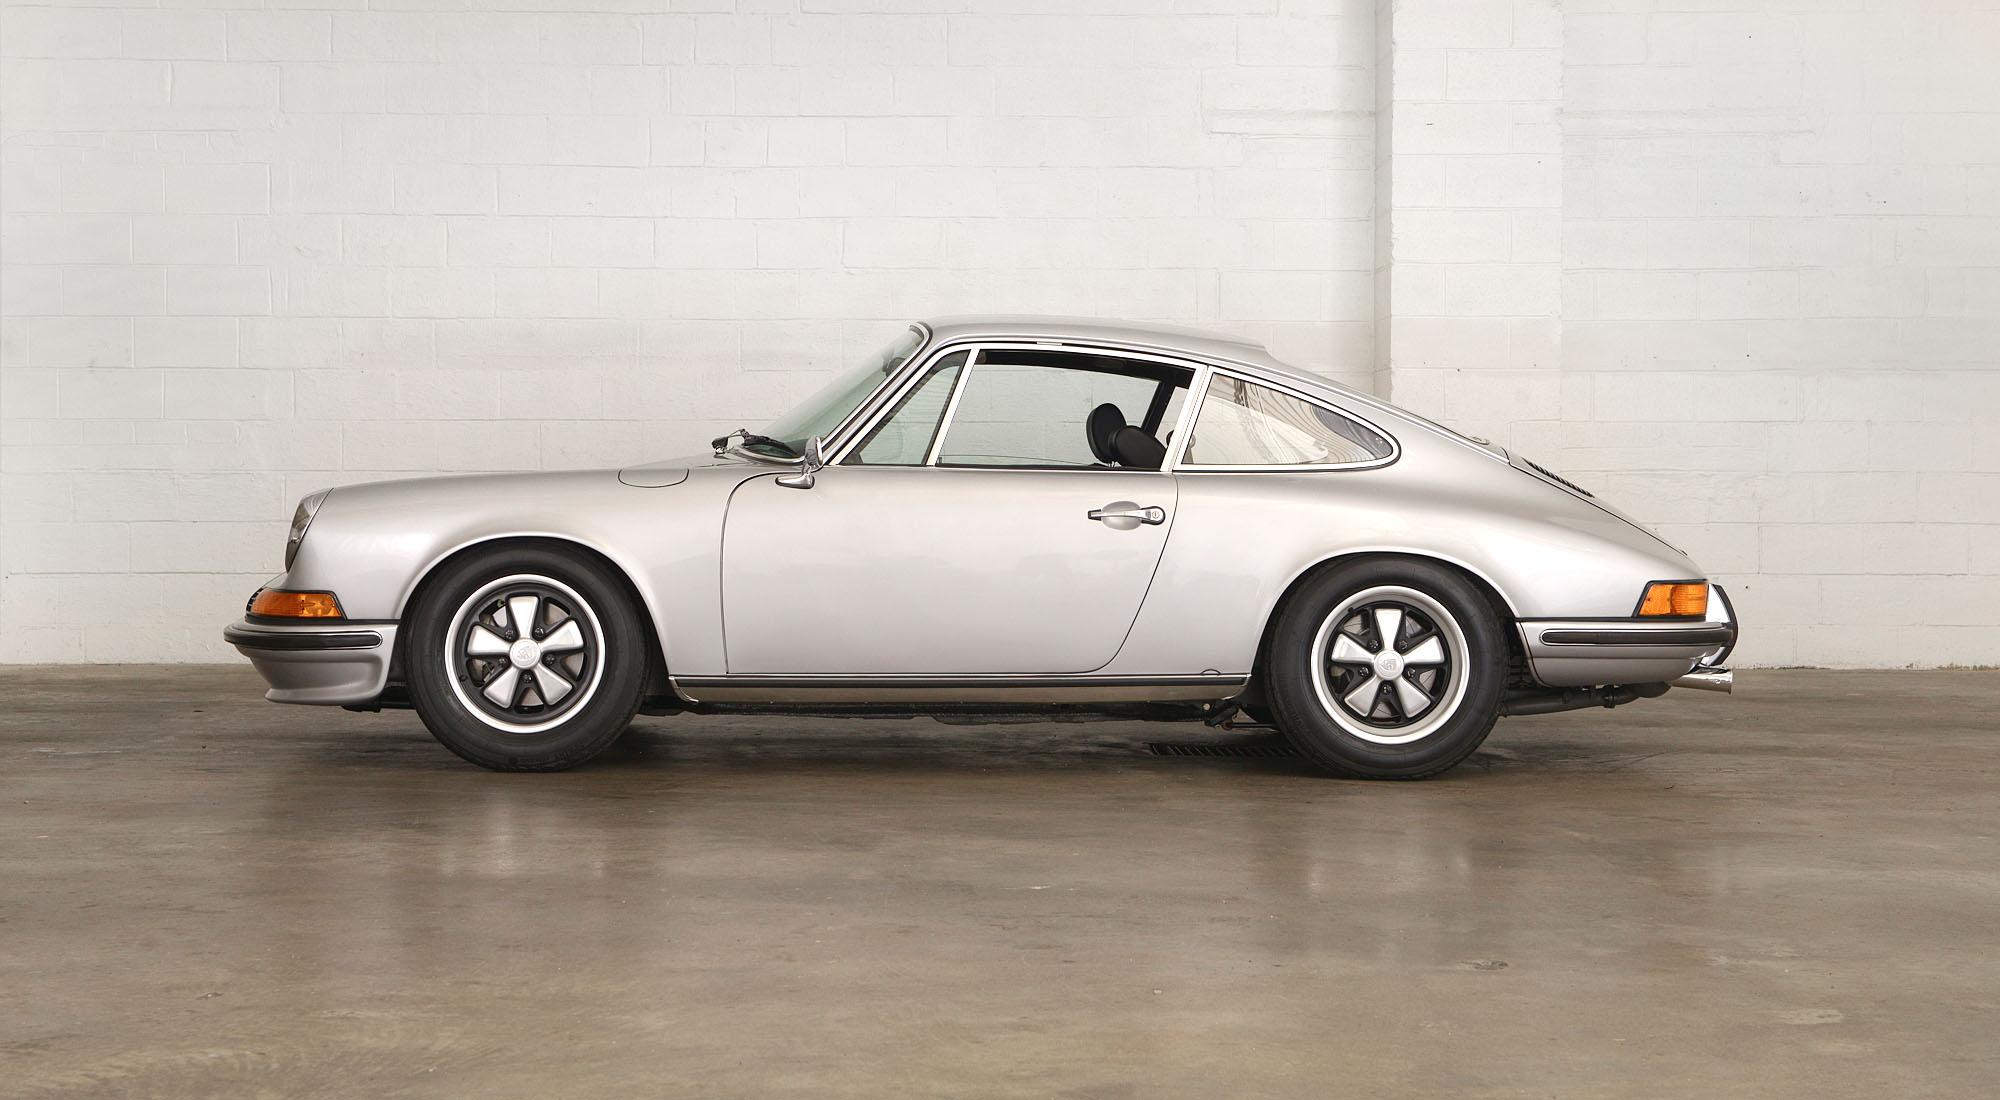 1973 Porsche 911 - 911S   Clic Driver Market